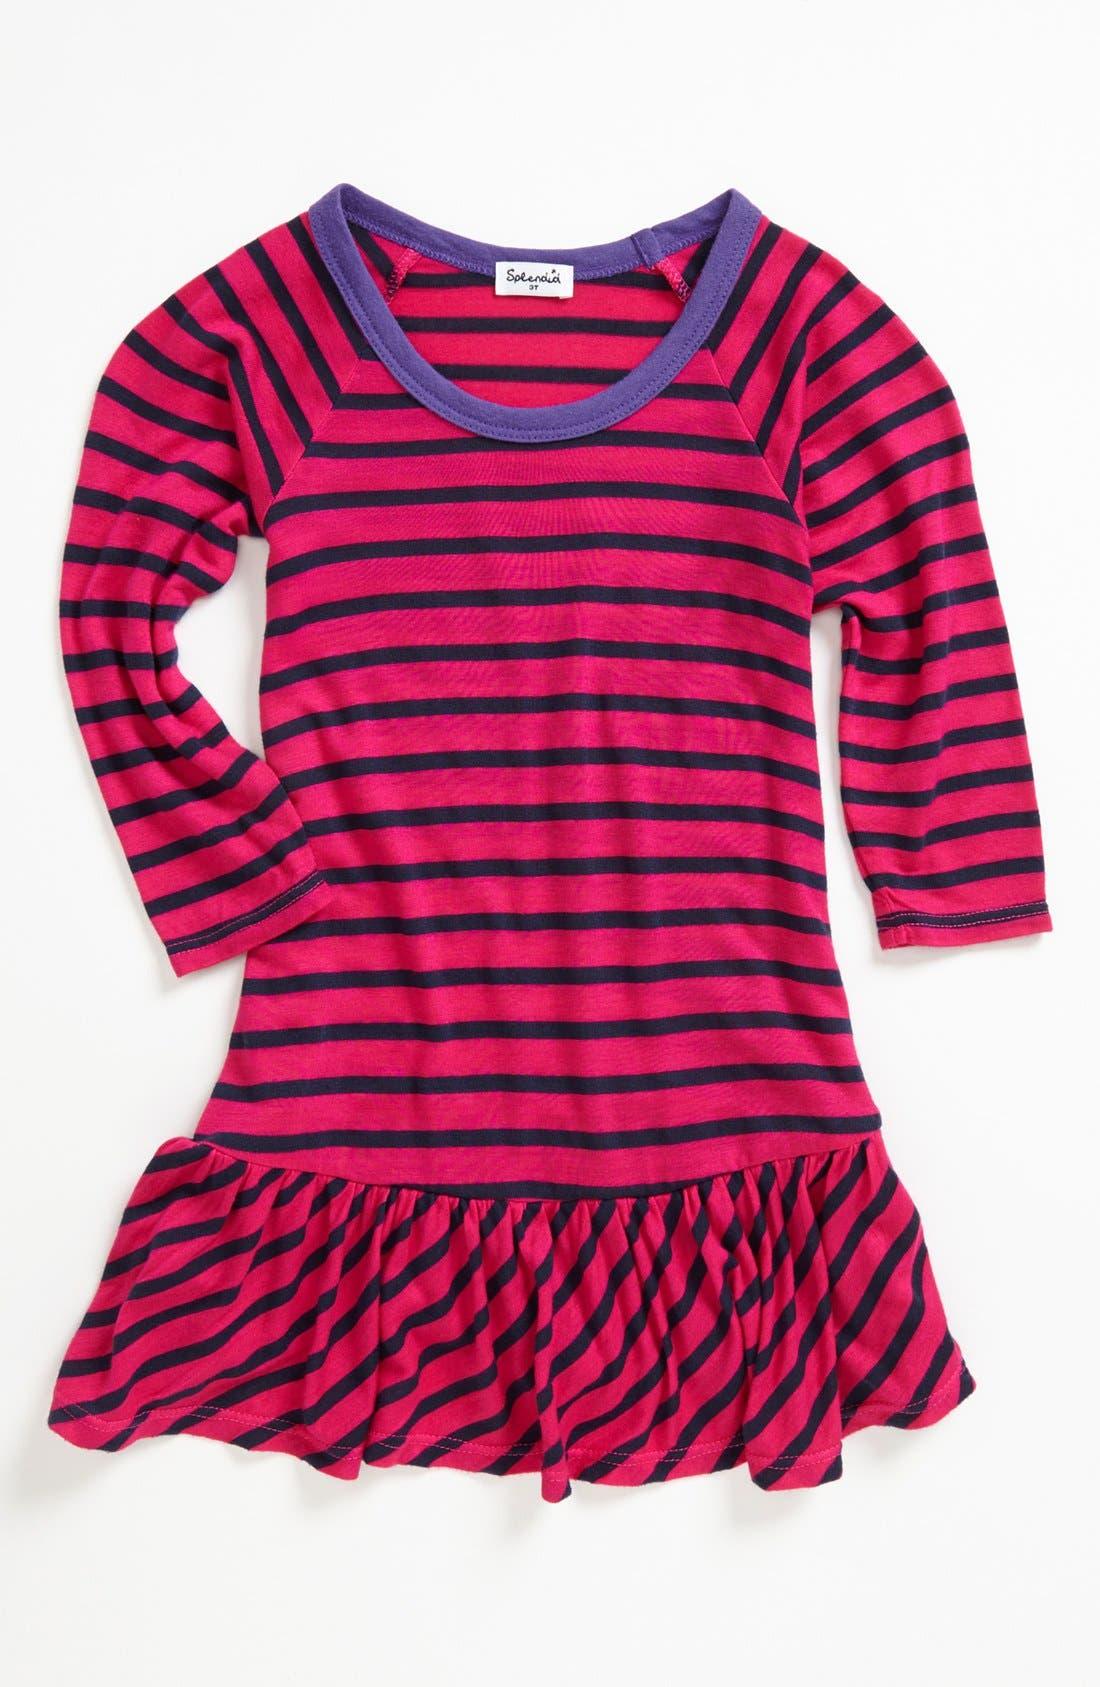 Alternate Image 1 Selected - Splendid Drop Waist Dress (Toddler Girls) (Online Only)